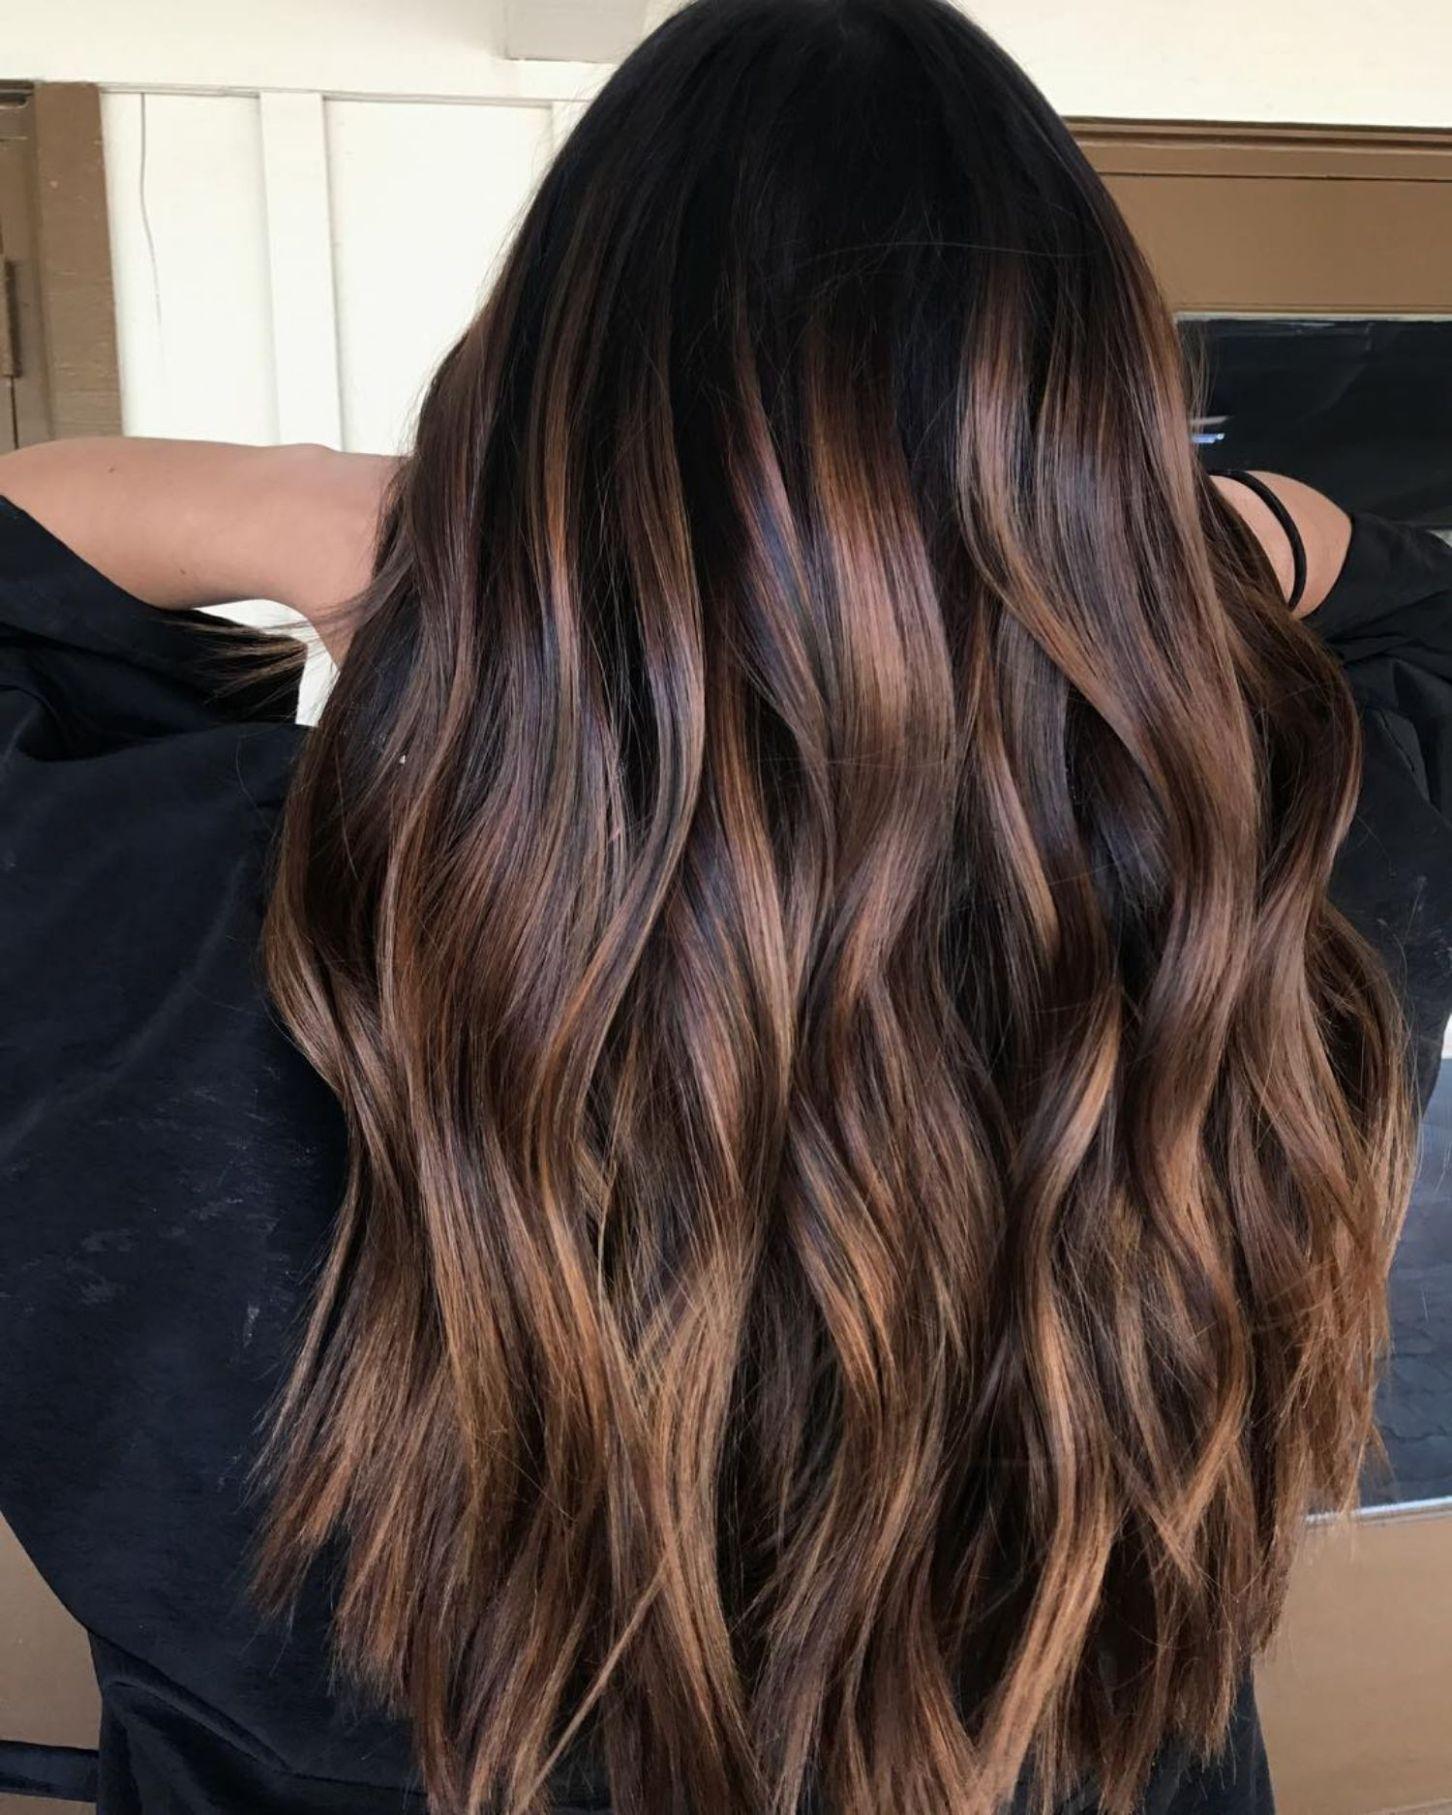 60 Hairstyles Featuring Dark Brown Hair With Highlights Hair Color For Black Hair Brown Hair With Highlights Long Brown Hair